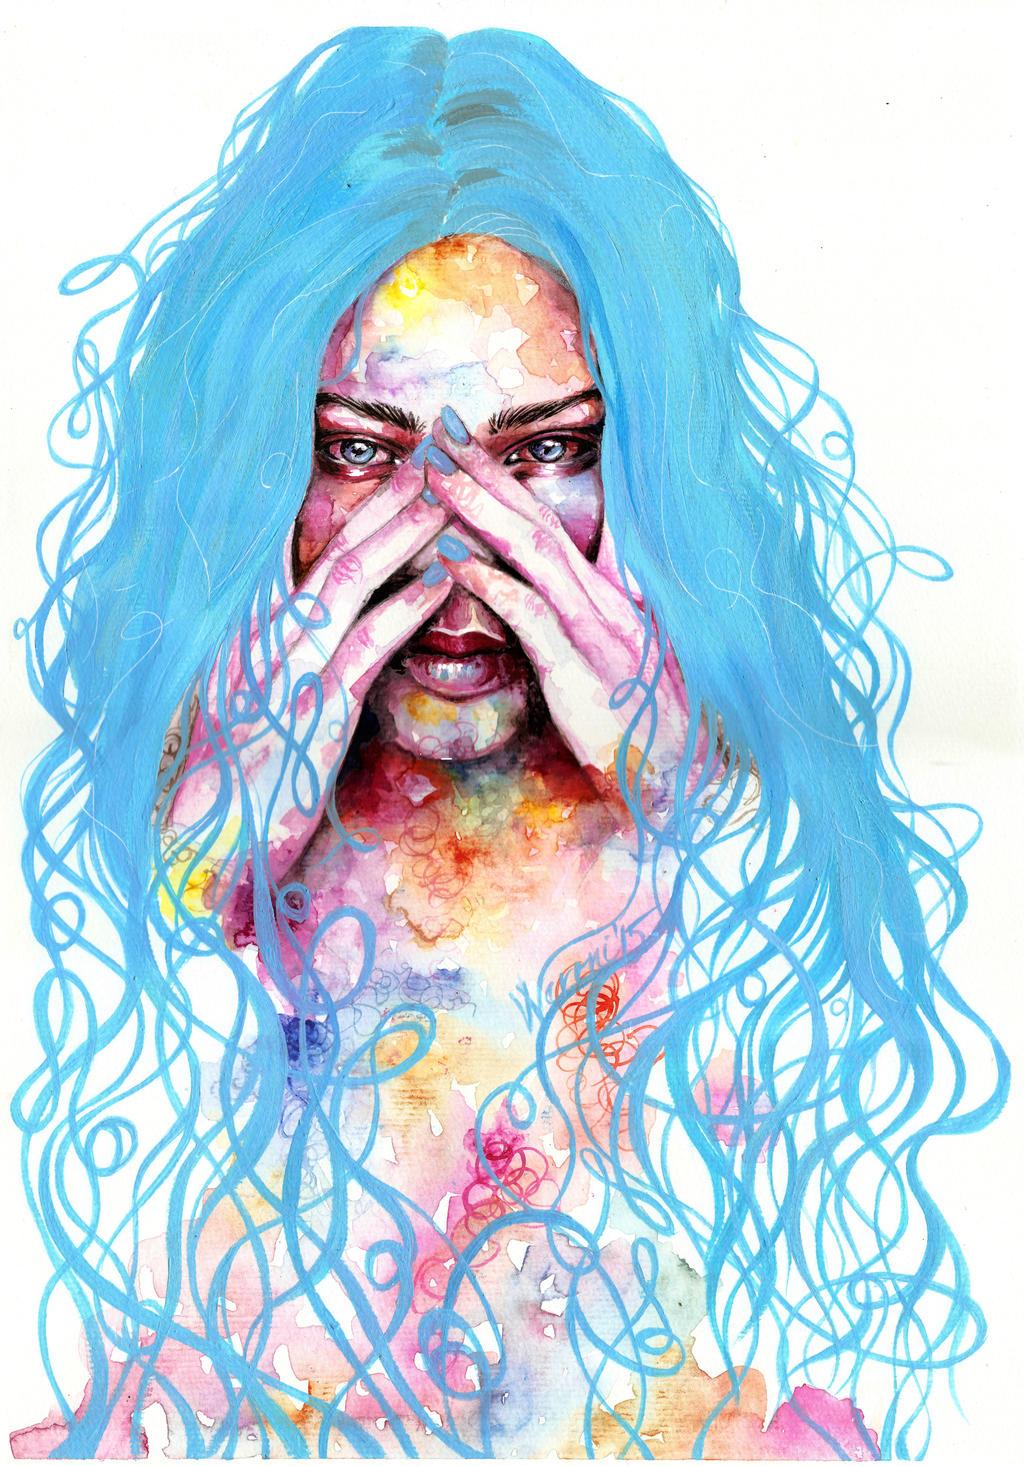 My True Colors by weroni